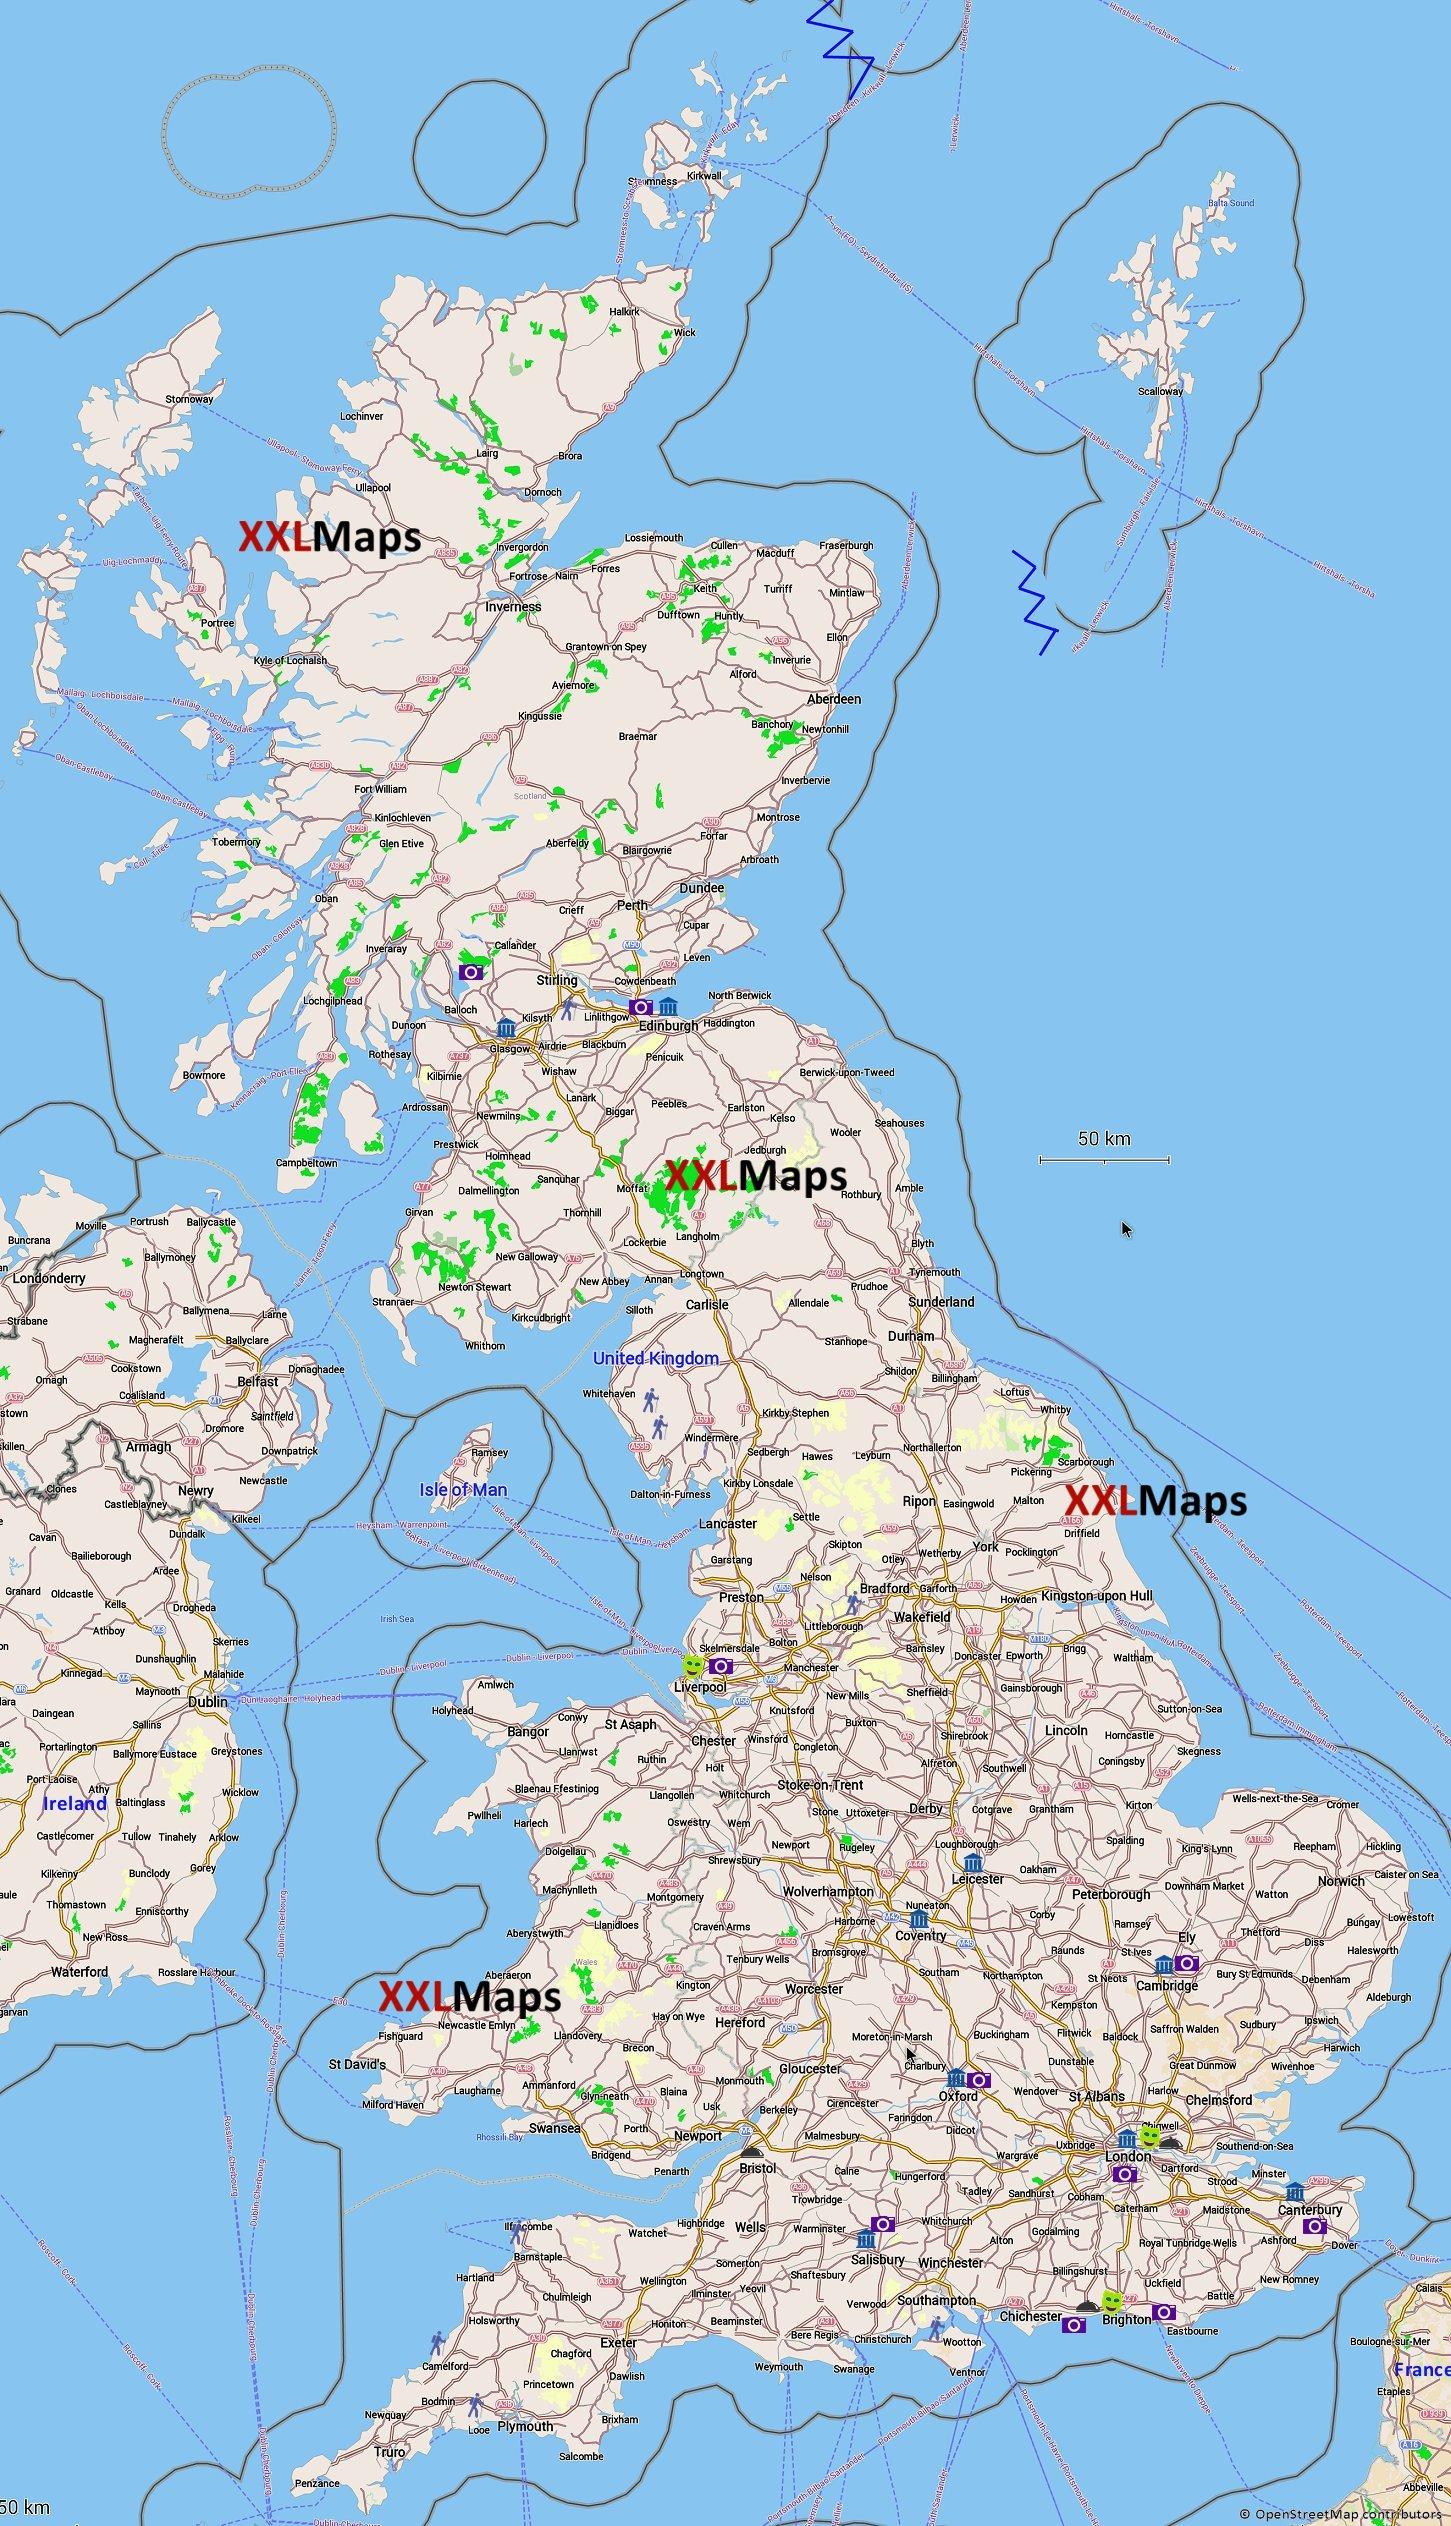 kart over storbritannia Turist kart over Storbritannia   gratis nedlasting for  kart over storbritannia